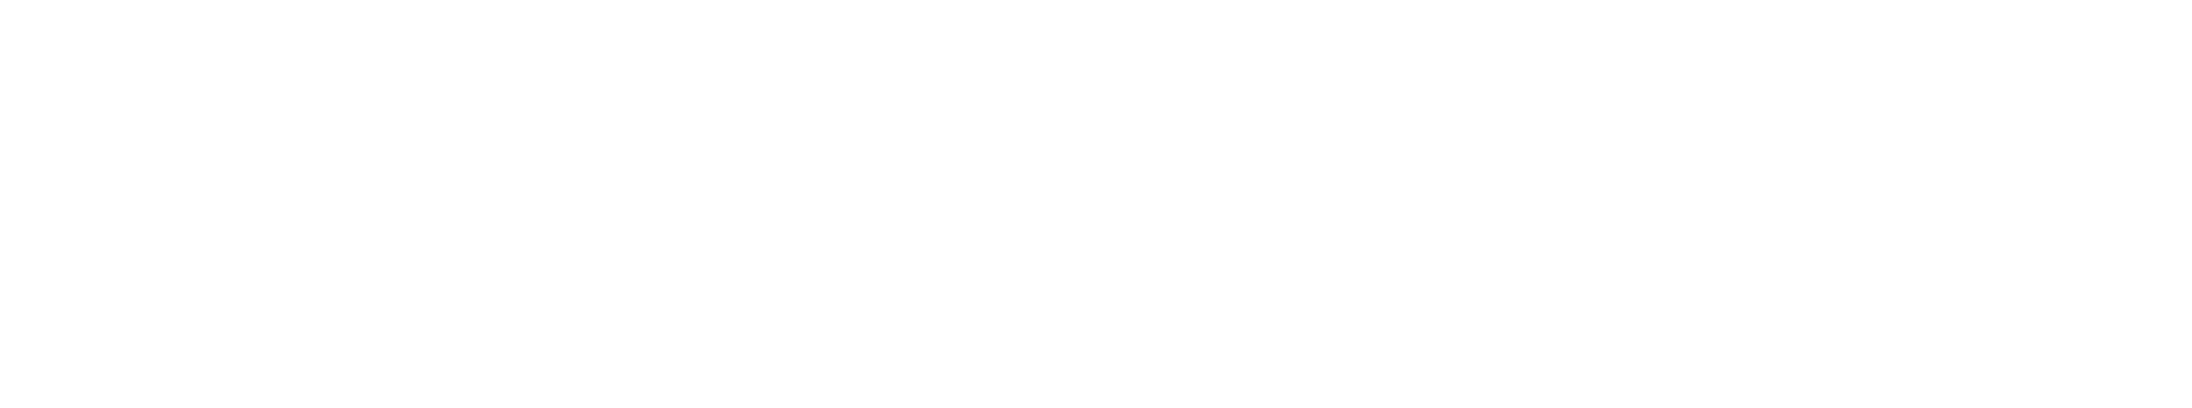 GR.×FRONTEND ENGINEER